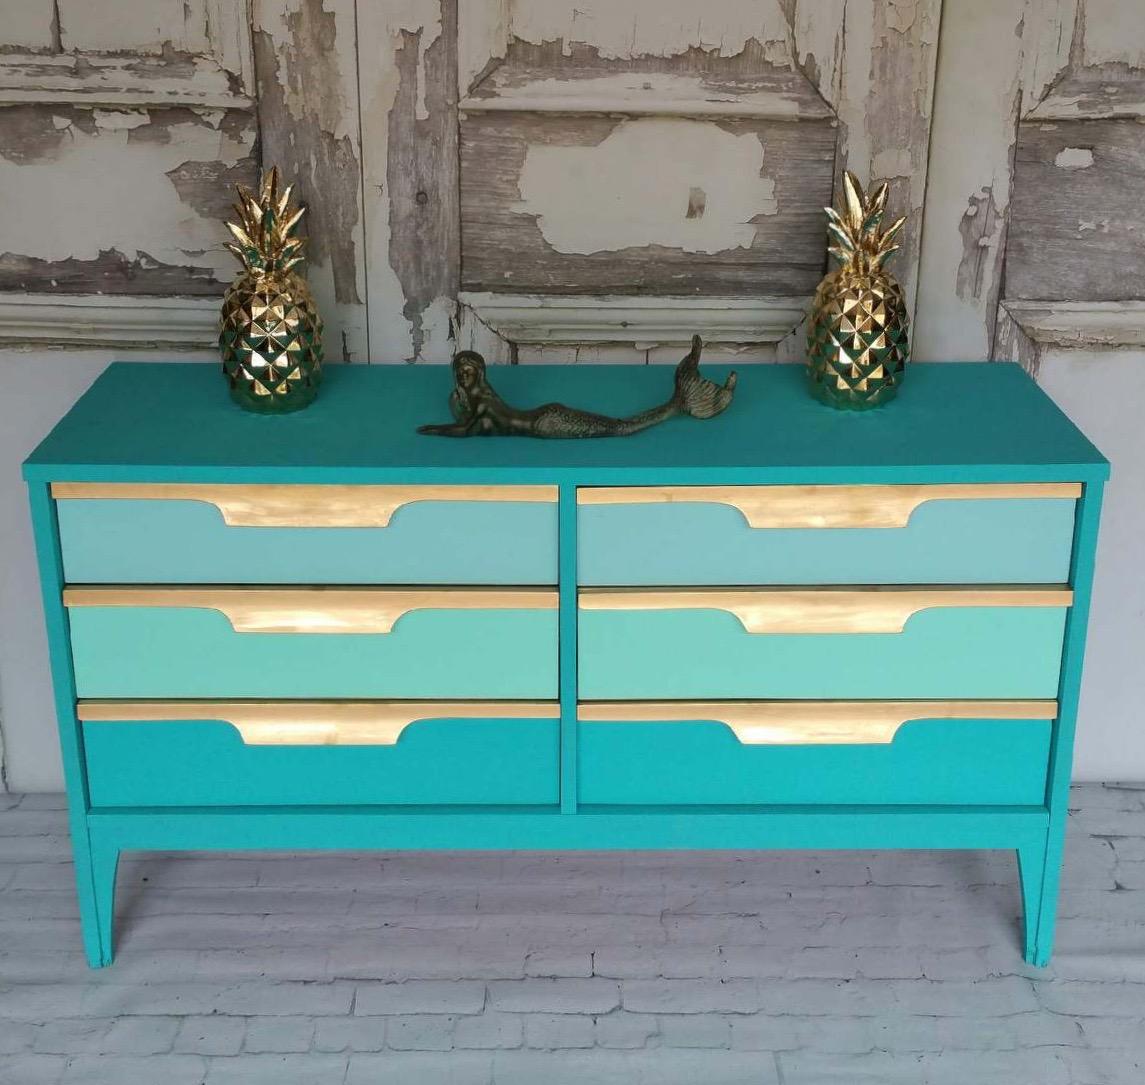 Teal Mid-century Modern Dresser - Tracey's Fancy